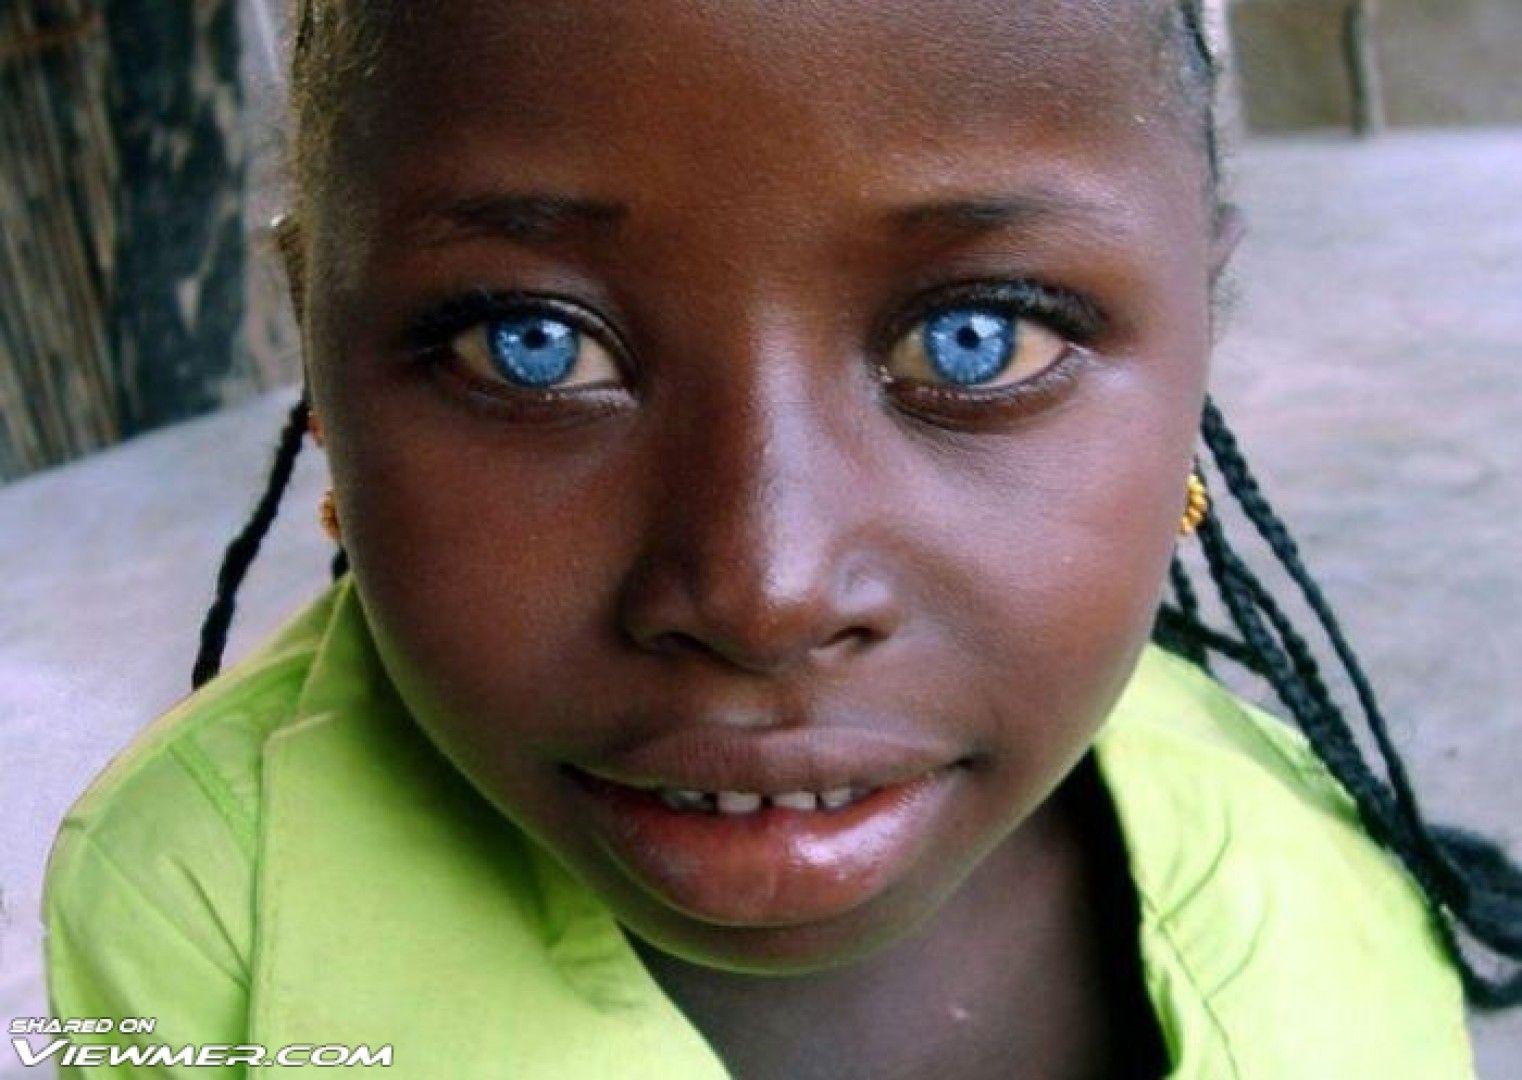 Cute Girl With Blue Eyes Dark Skin Amp Light Eyes